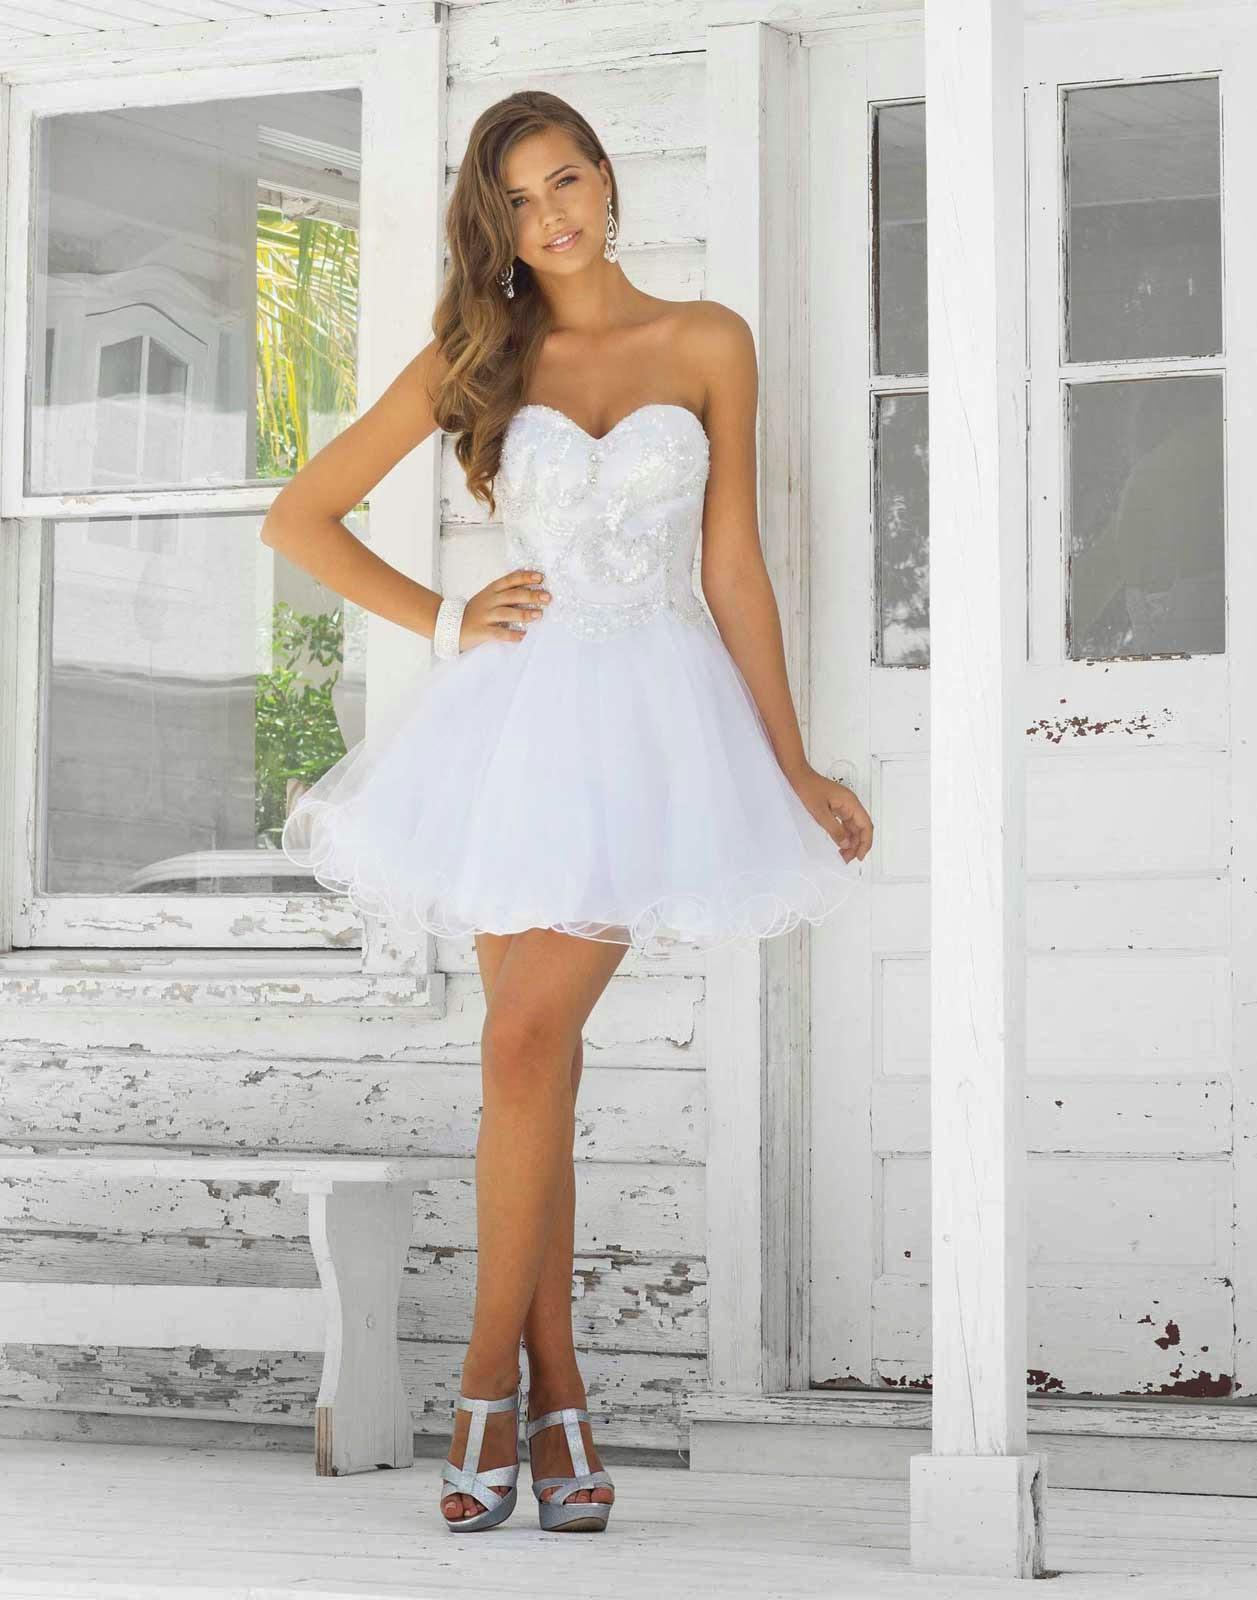 Cheap short white wedding dresses 2013 photos concepts ideas for White short wedding dresses cheap